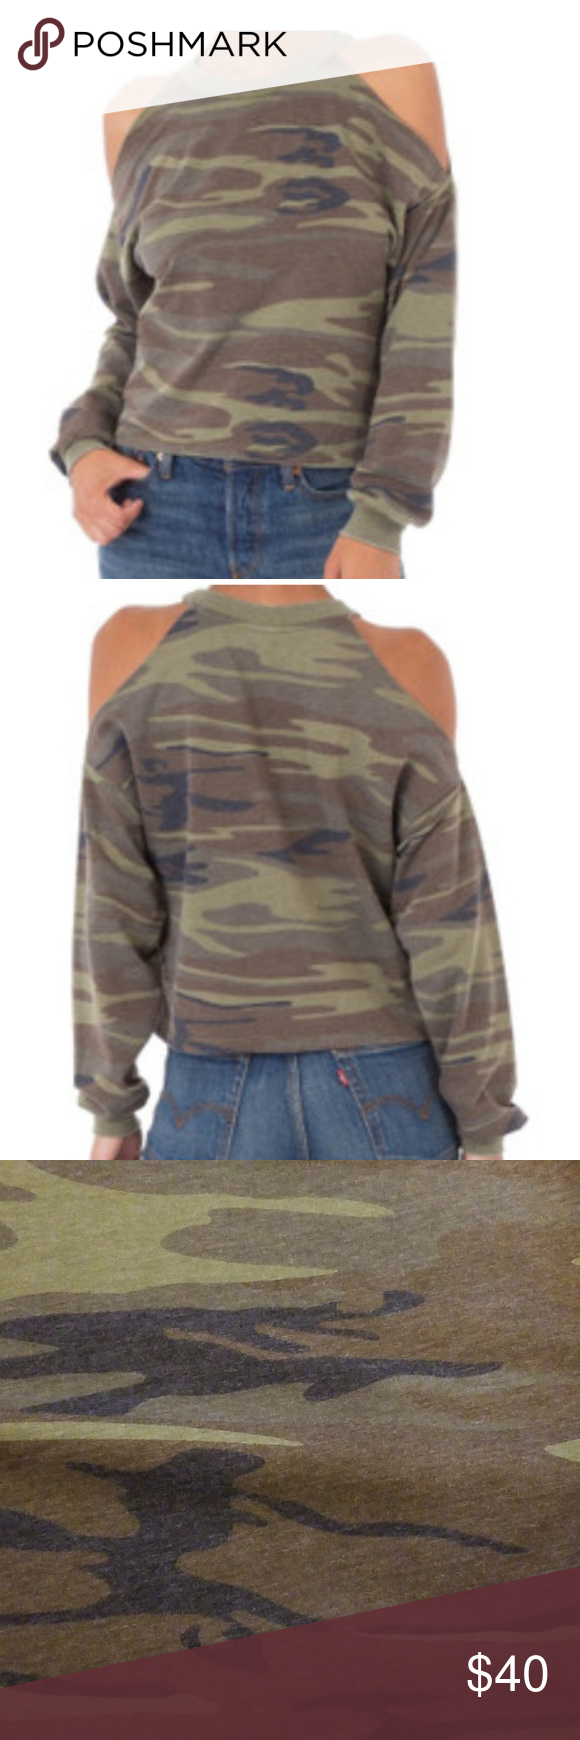 ea321c99605364 Z Supply cold shoulder sweatshirt Z Supply cold shoulder camouflage  sweatshirt Z Supply Tops Sweatshirts   Hoodies